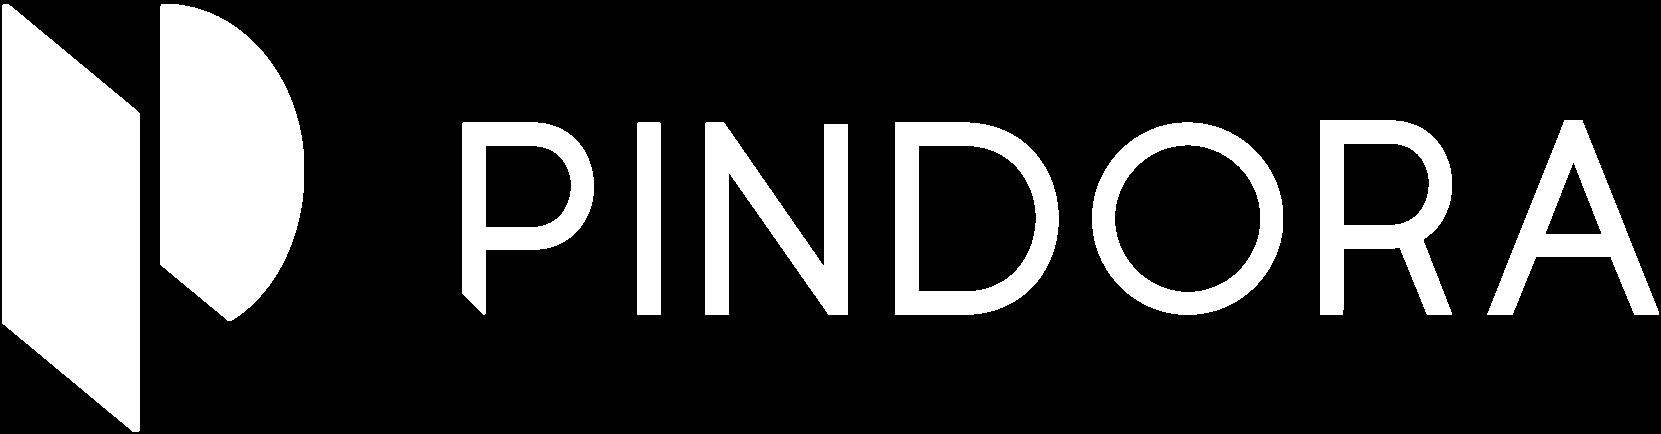 Pindora